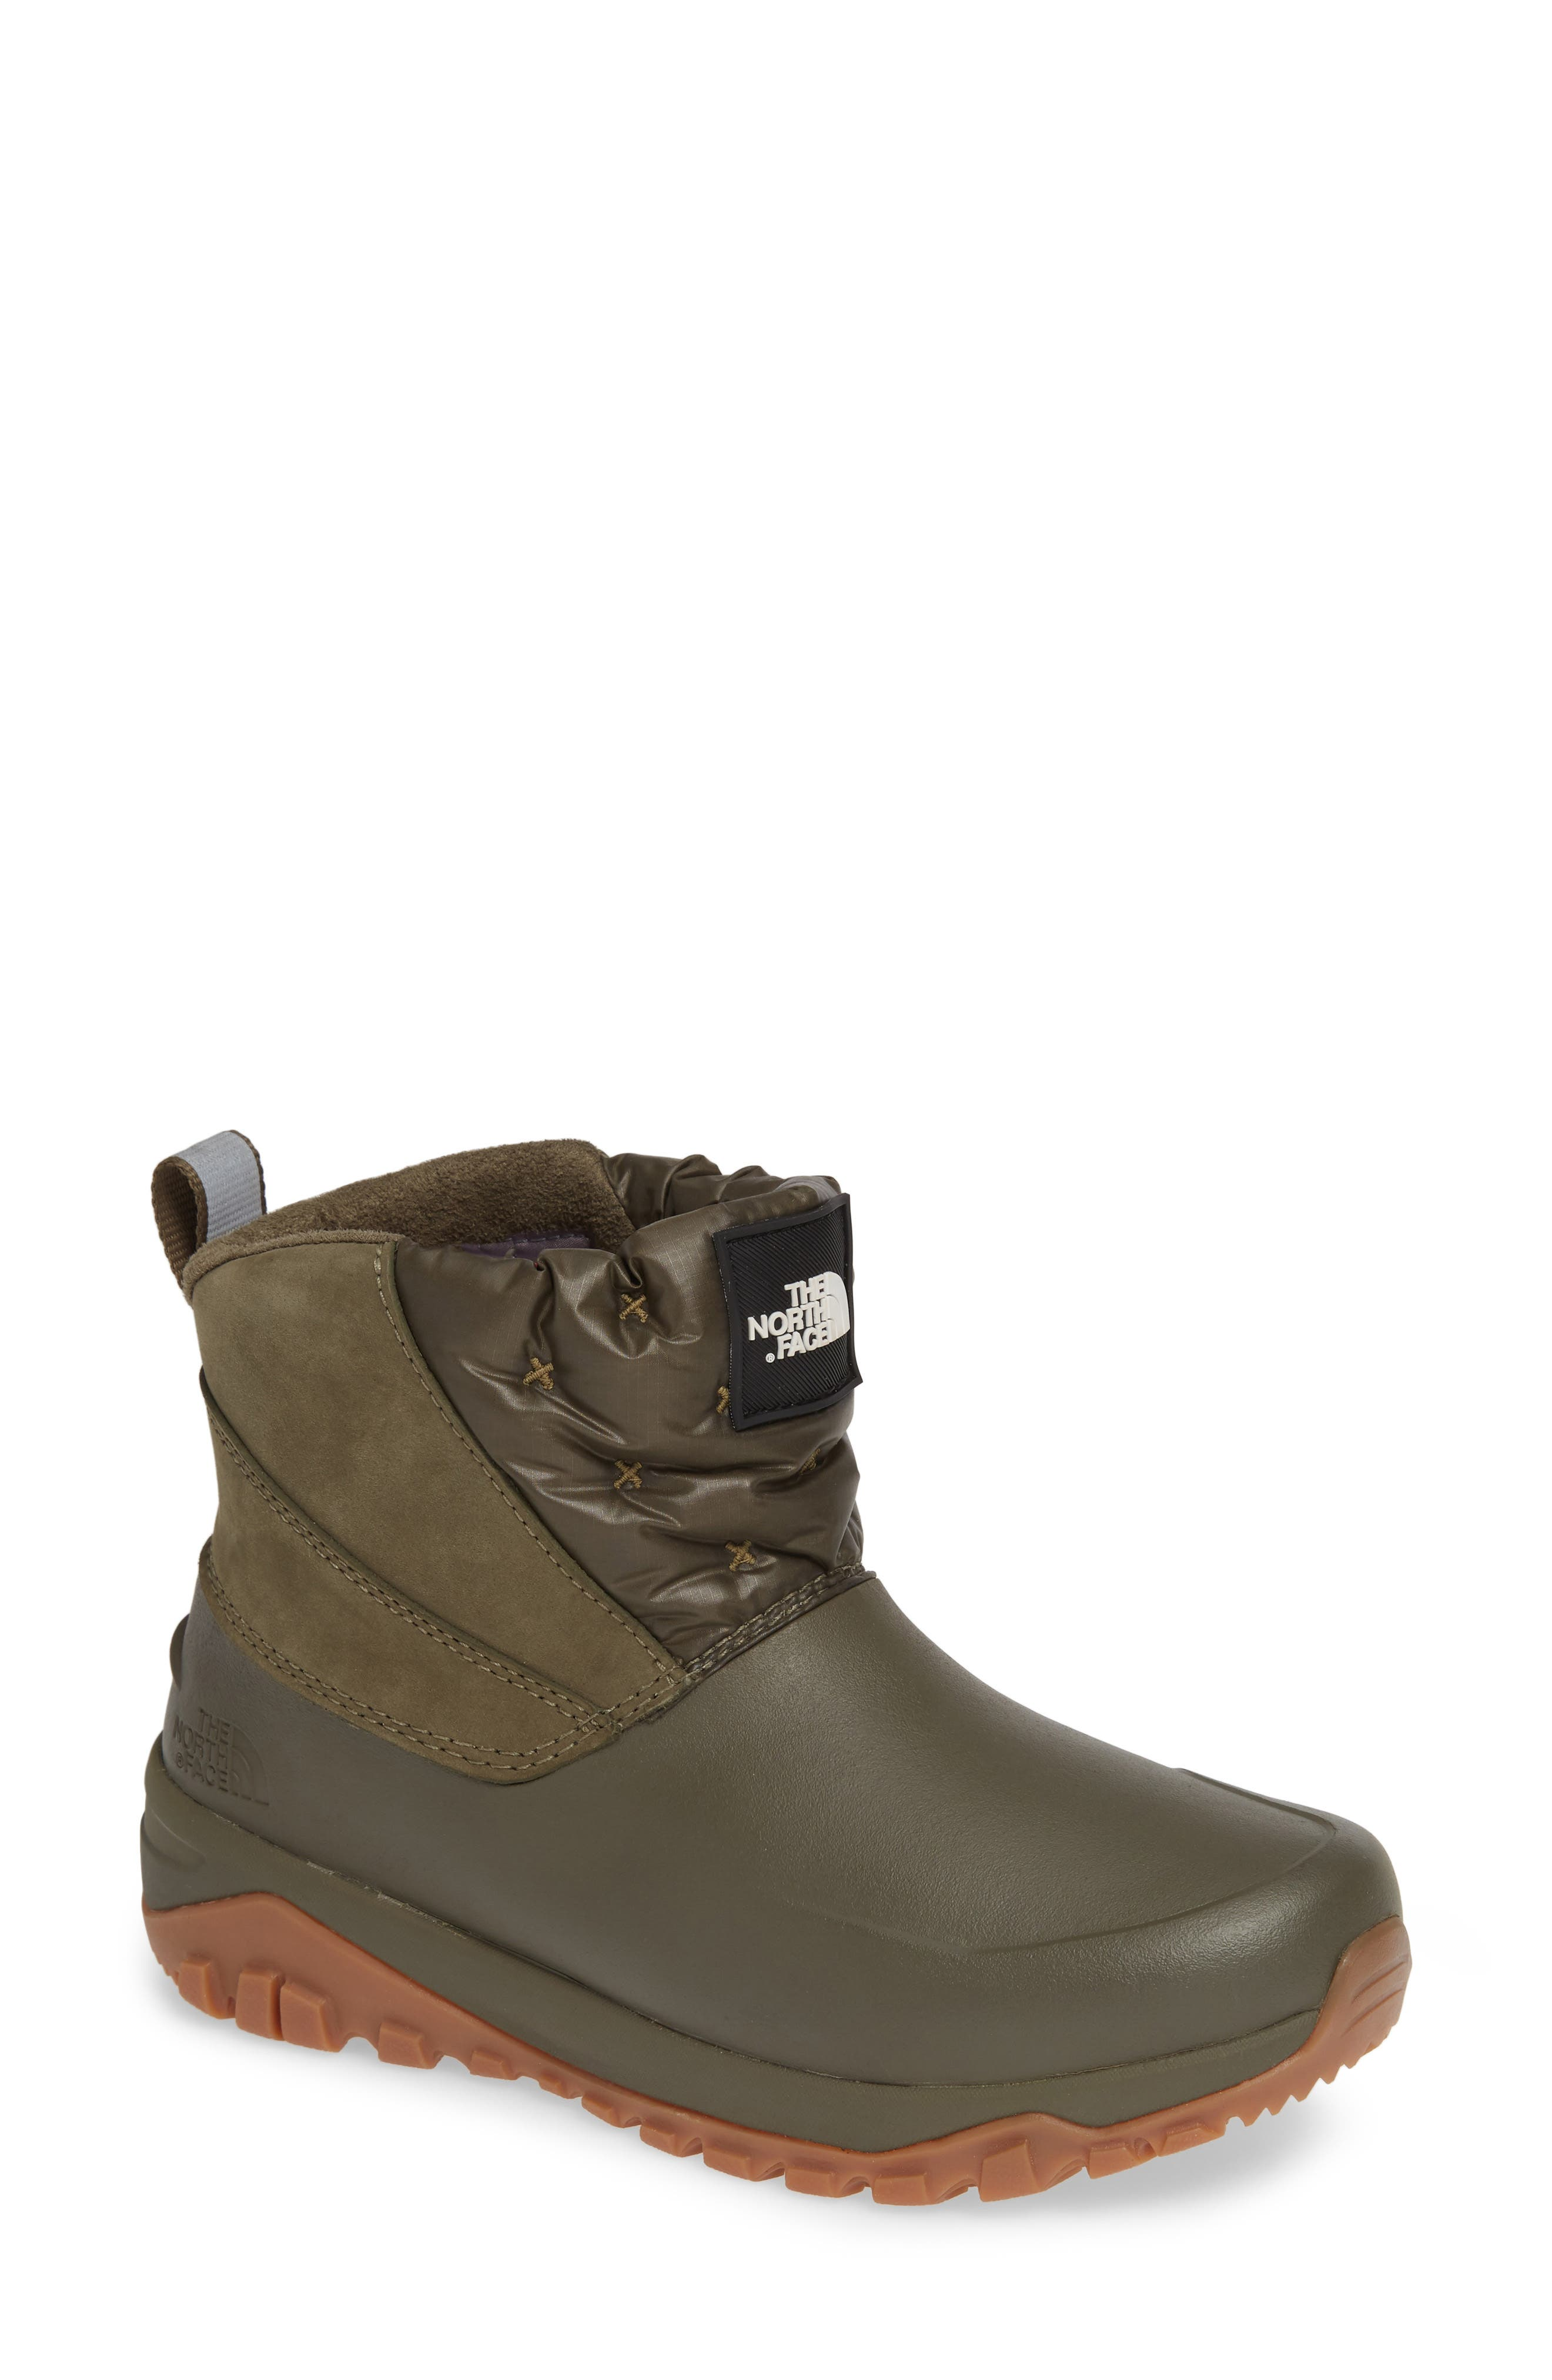 Yukiona Waterproof Ankle Boot